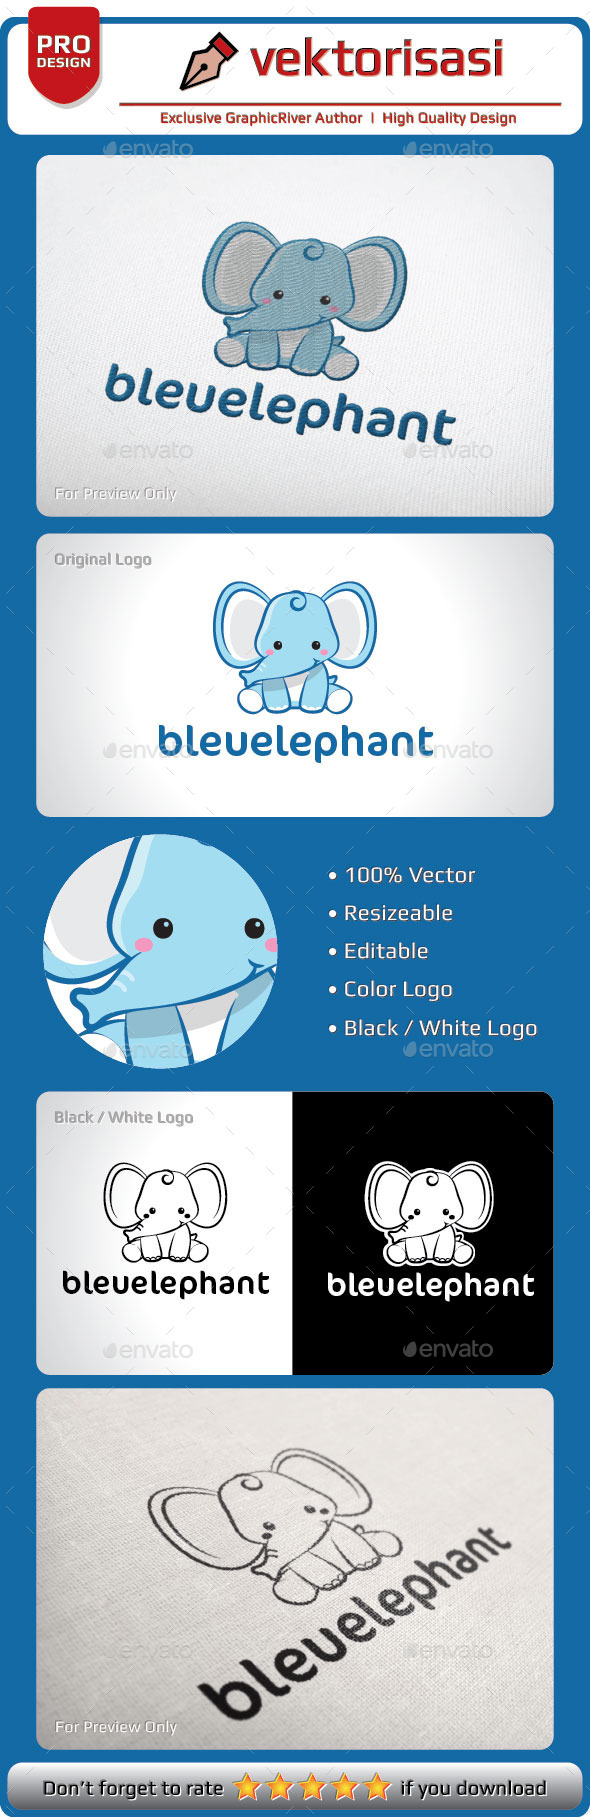 bleuelephant logo template